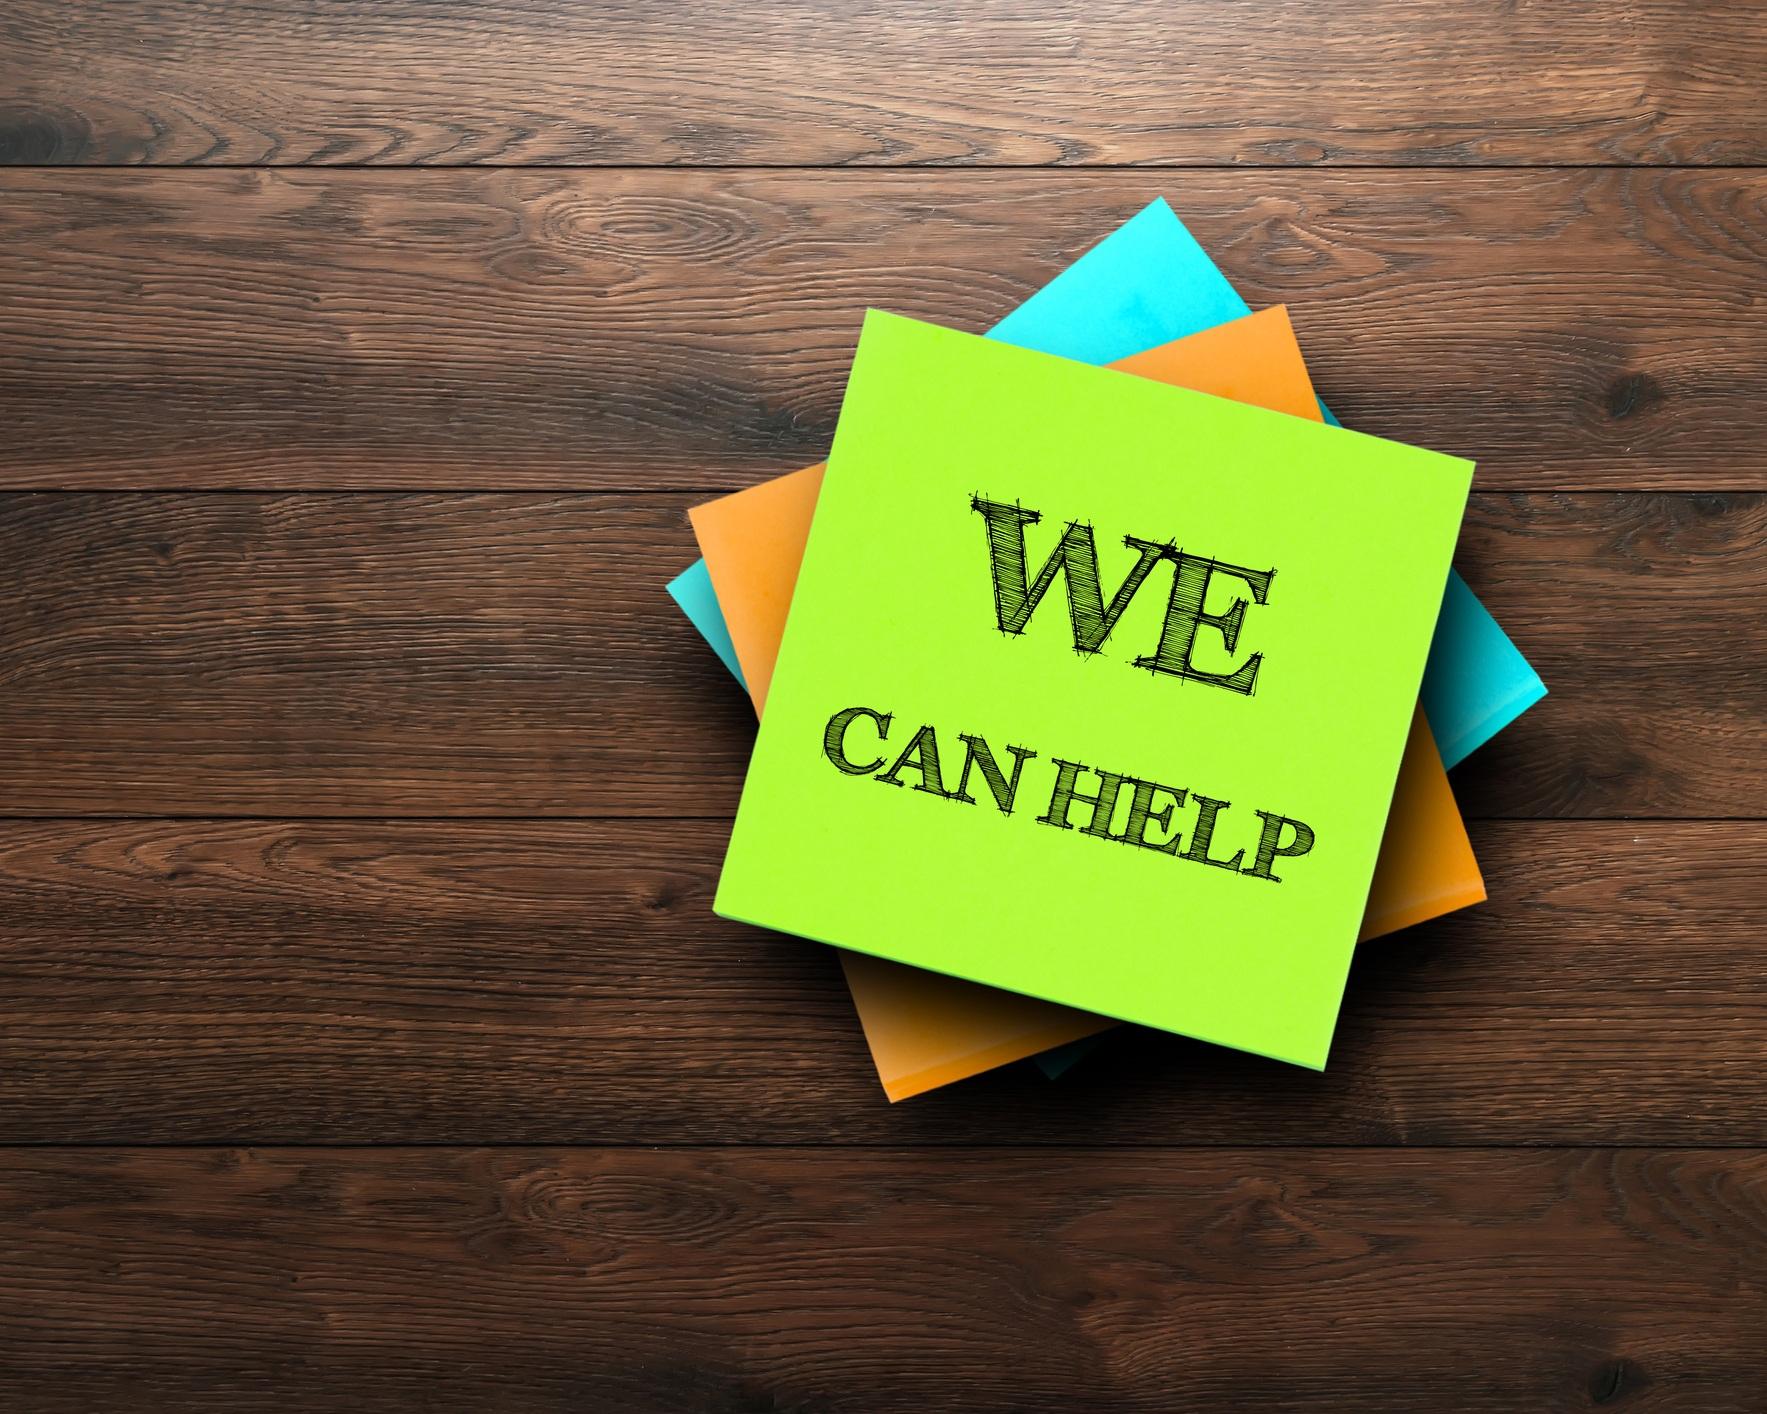 We+Can+Help_iStock-956959400.jpg